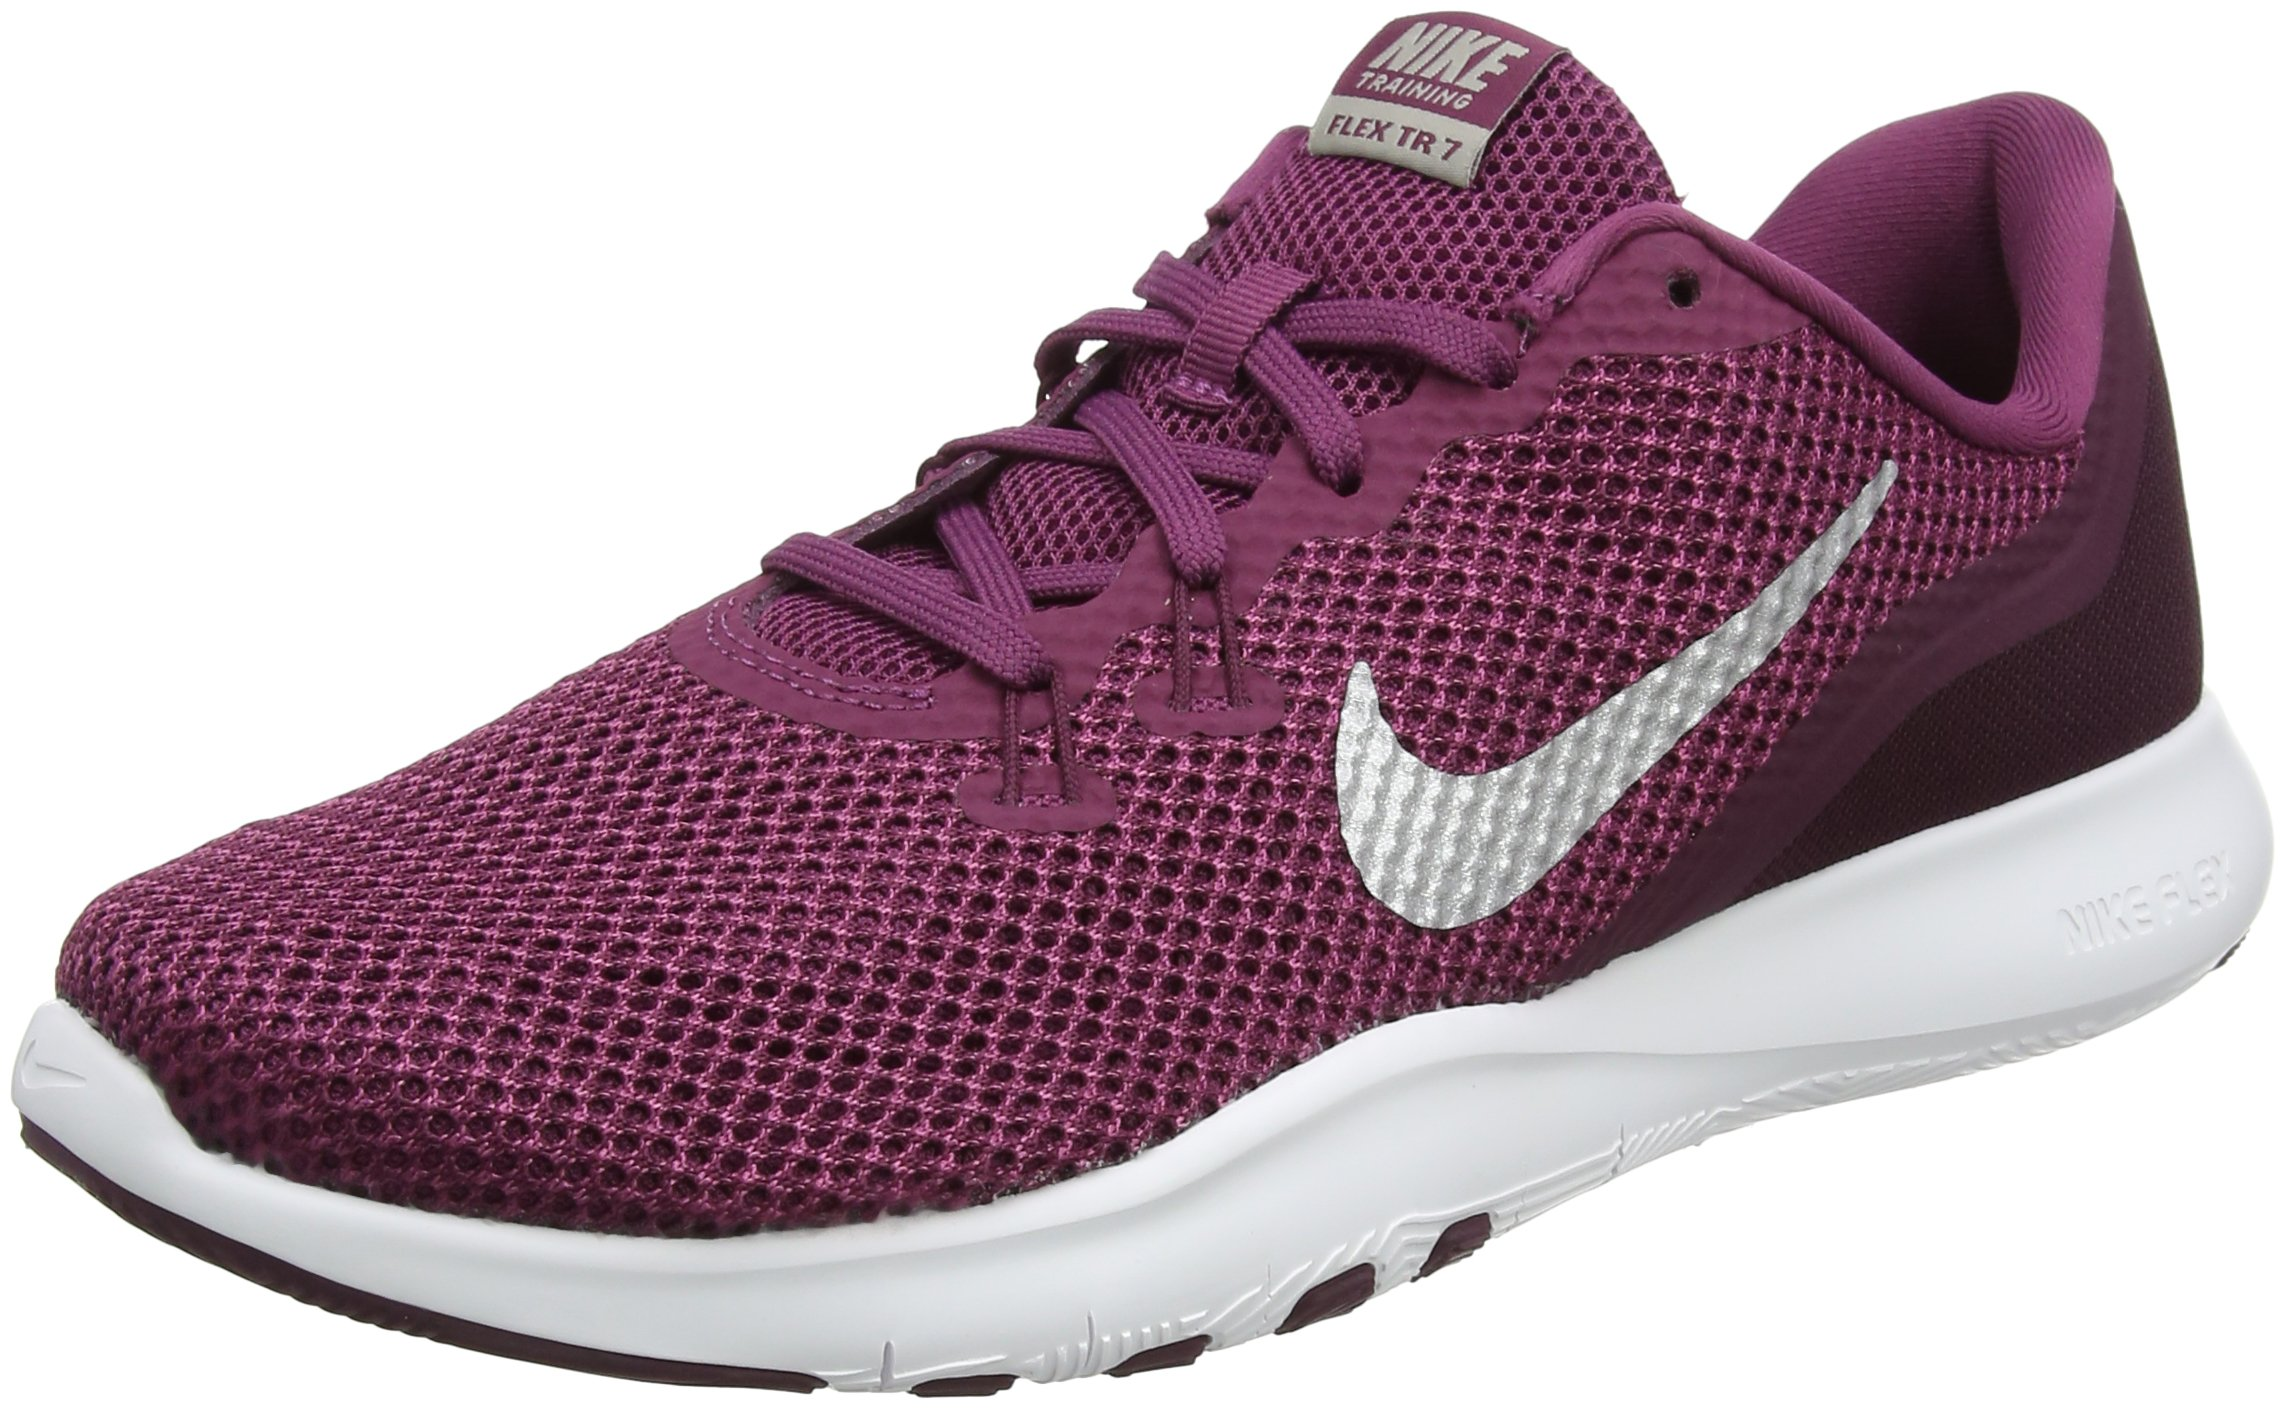 66c8c4c4e8b Galleon - Nike Women s Flex TR 7 Training Shoe Tea Berry Metallic  Silver Bordeaux Size 10 M US